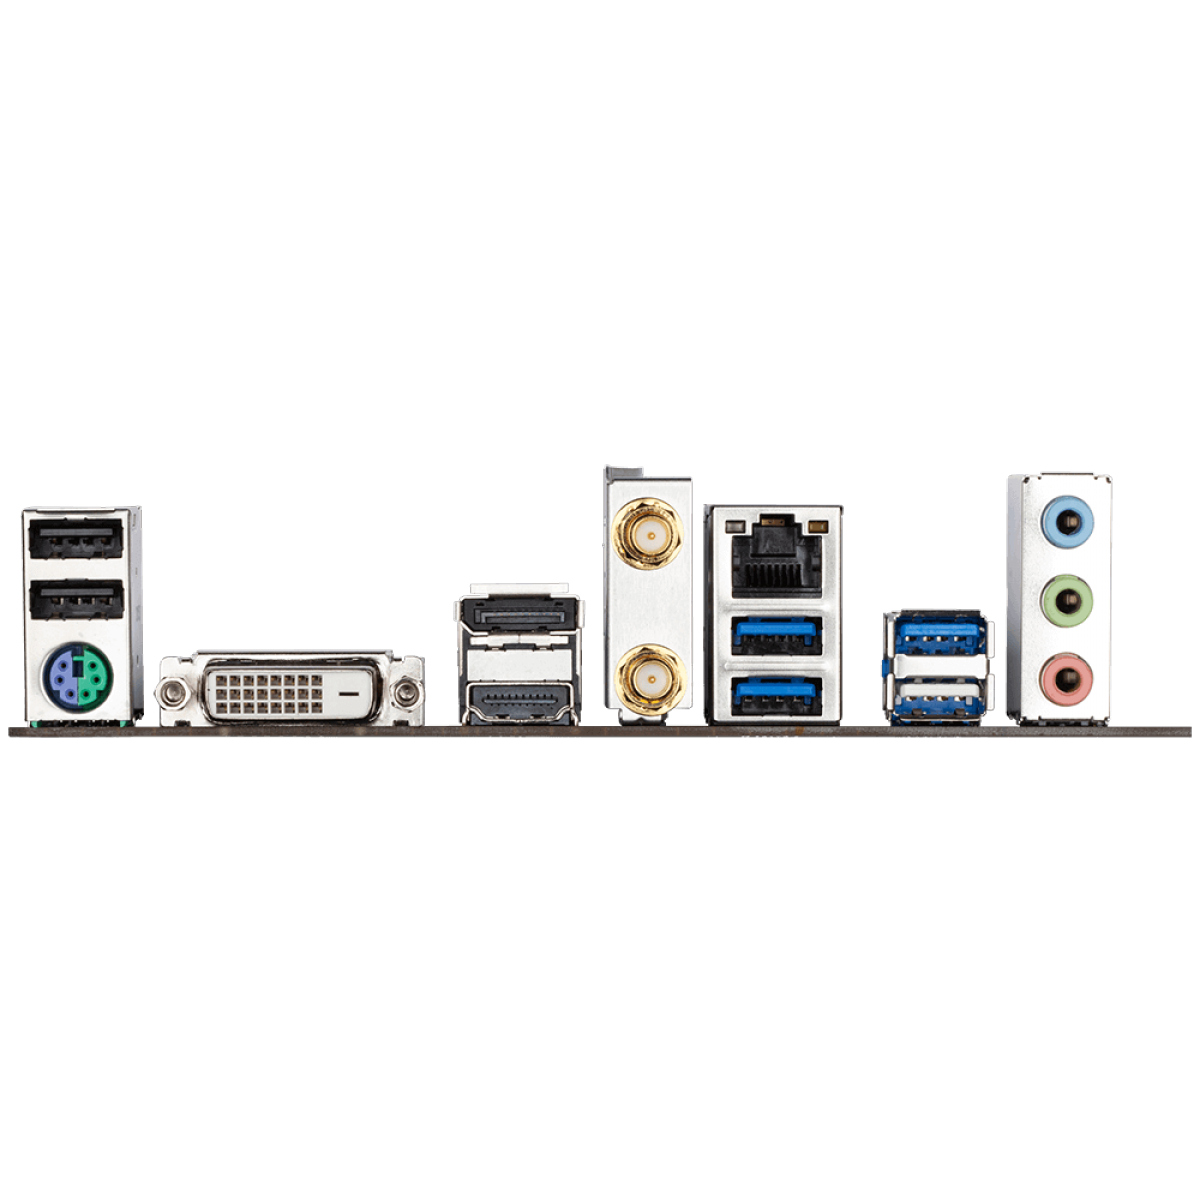 Placa Mãe Gigabyte A520M DS3H AC, Chipset A520, AMD AM4, Wi-Fi, mATX, DDR4, 9MA52M3HC-00-11 - Open Box